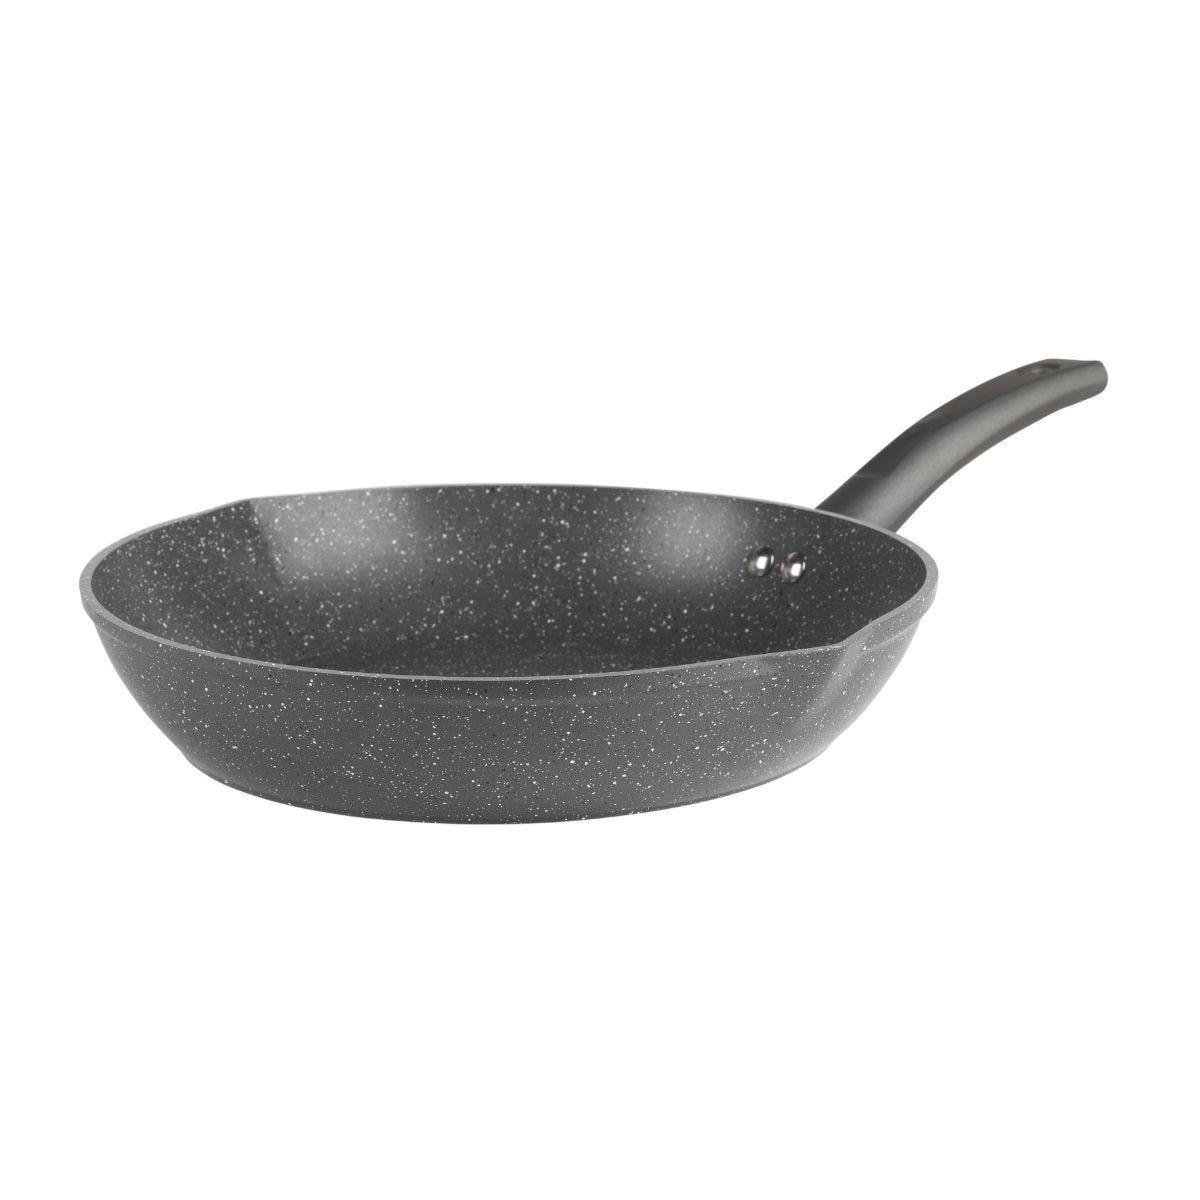 Salter Easy Pour Grey Frying Pan - 28cm